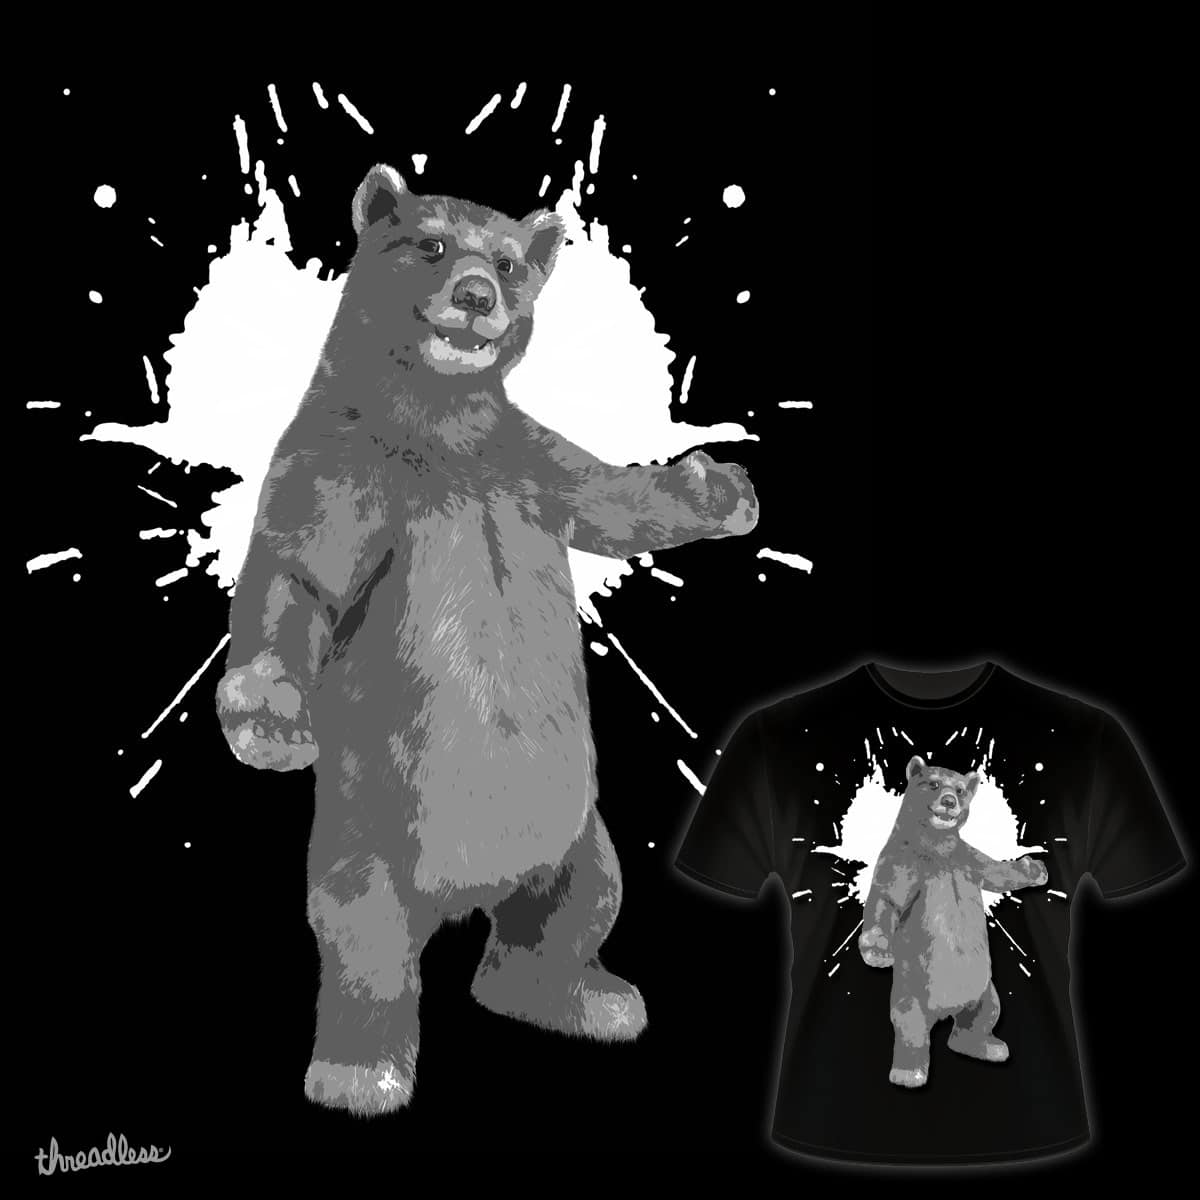 Give me a Hug! by wishurdesign on Threadless